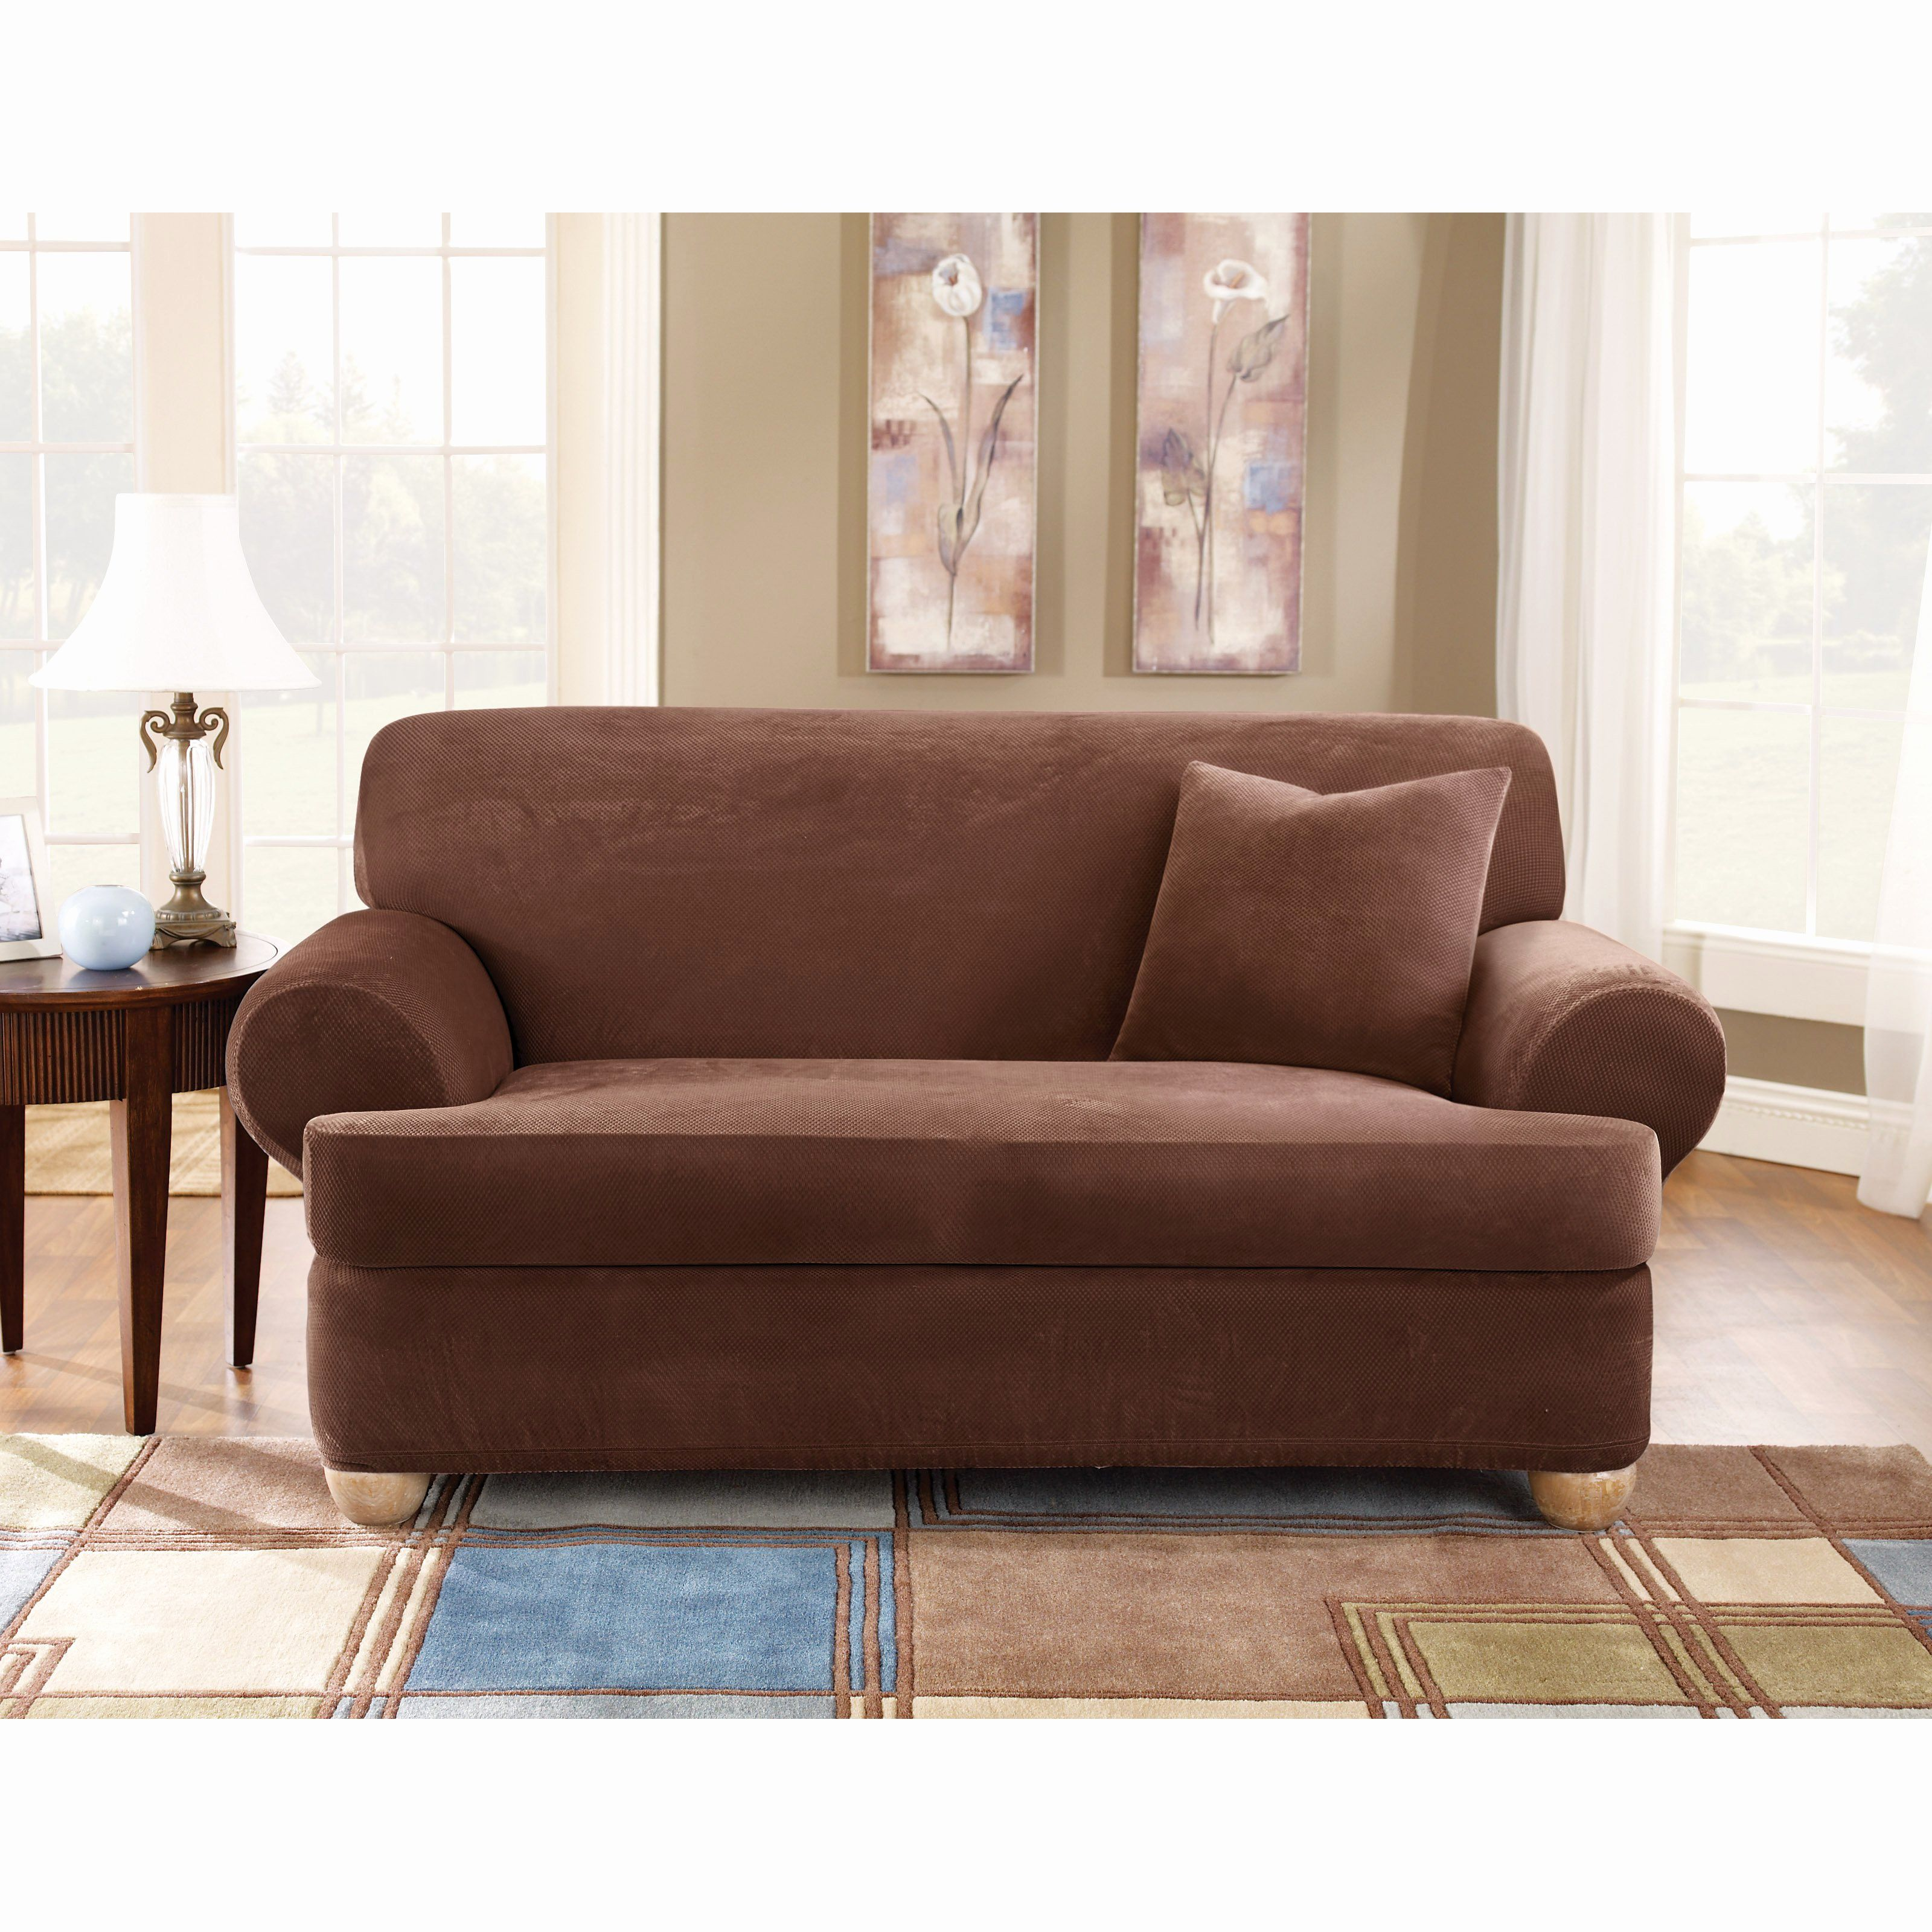 Lovely Walmart Sofa Covers Art Walmart Sofa Covers Lovely Sofa Covers Walmart Slipcovers For Chairs Cushions On Sofa Slipcovered Sofa